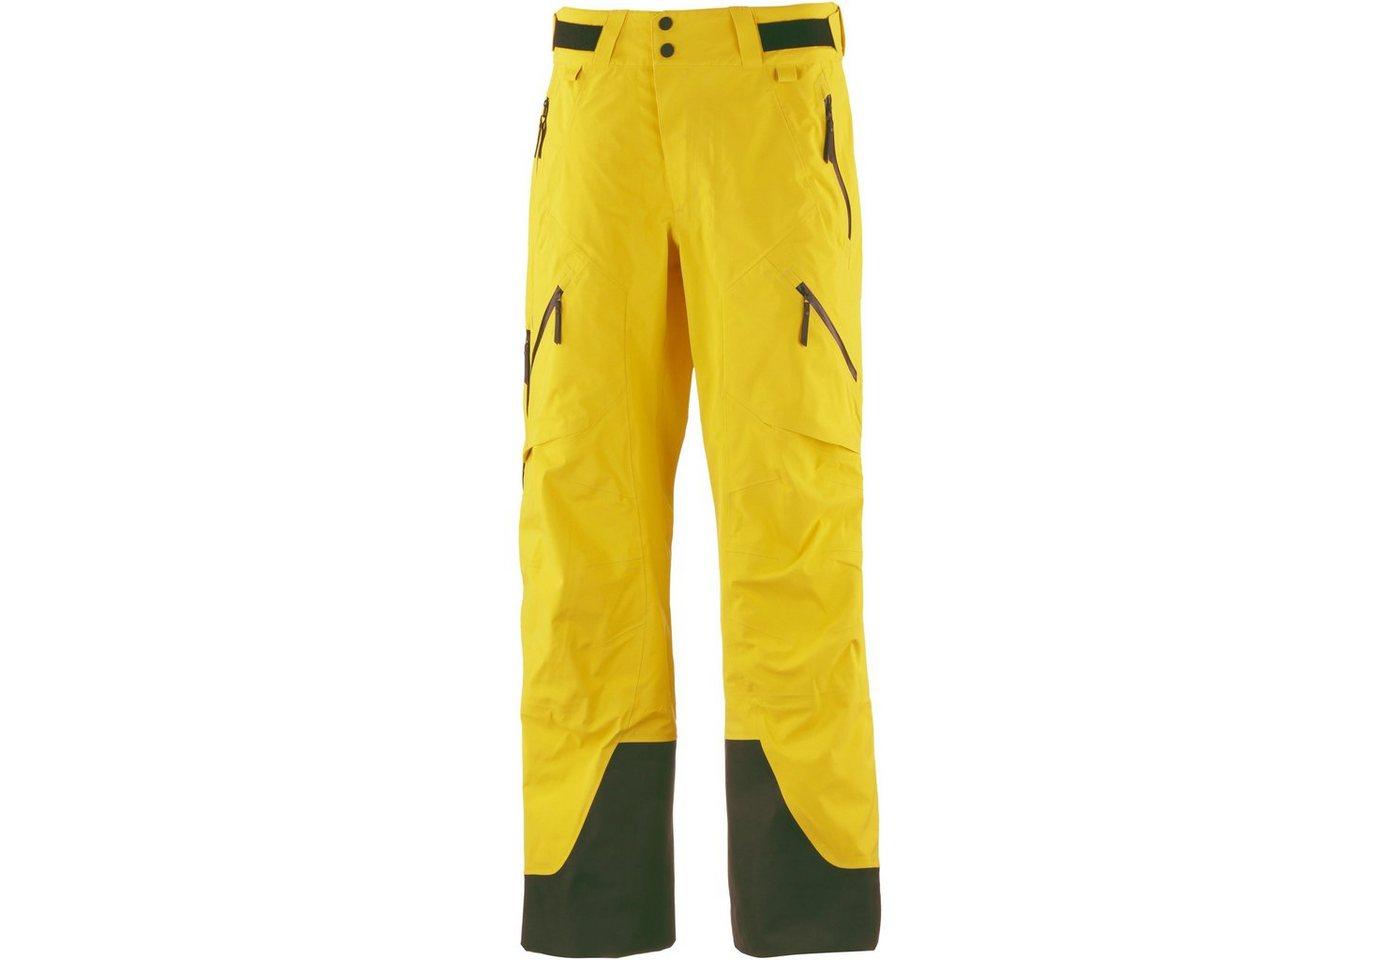 Herren Peak Performance Skihose »Gravity GORE-TEX®« gelb, rot   05713112118598